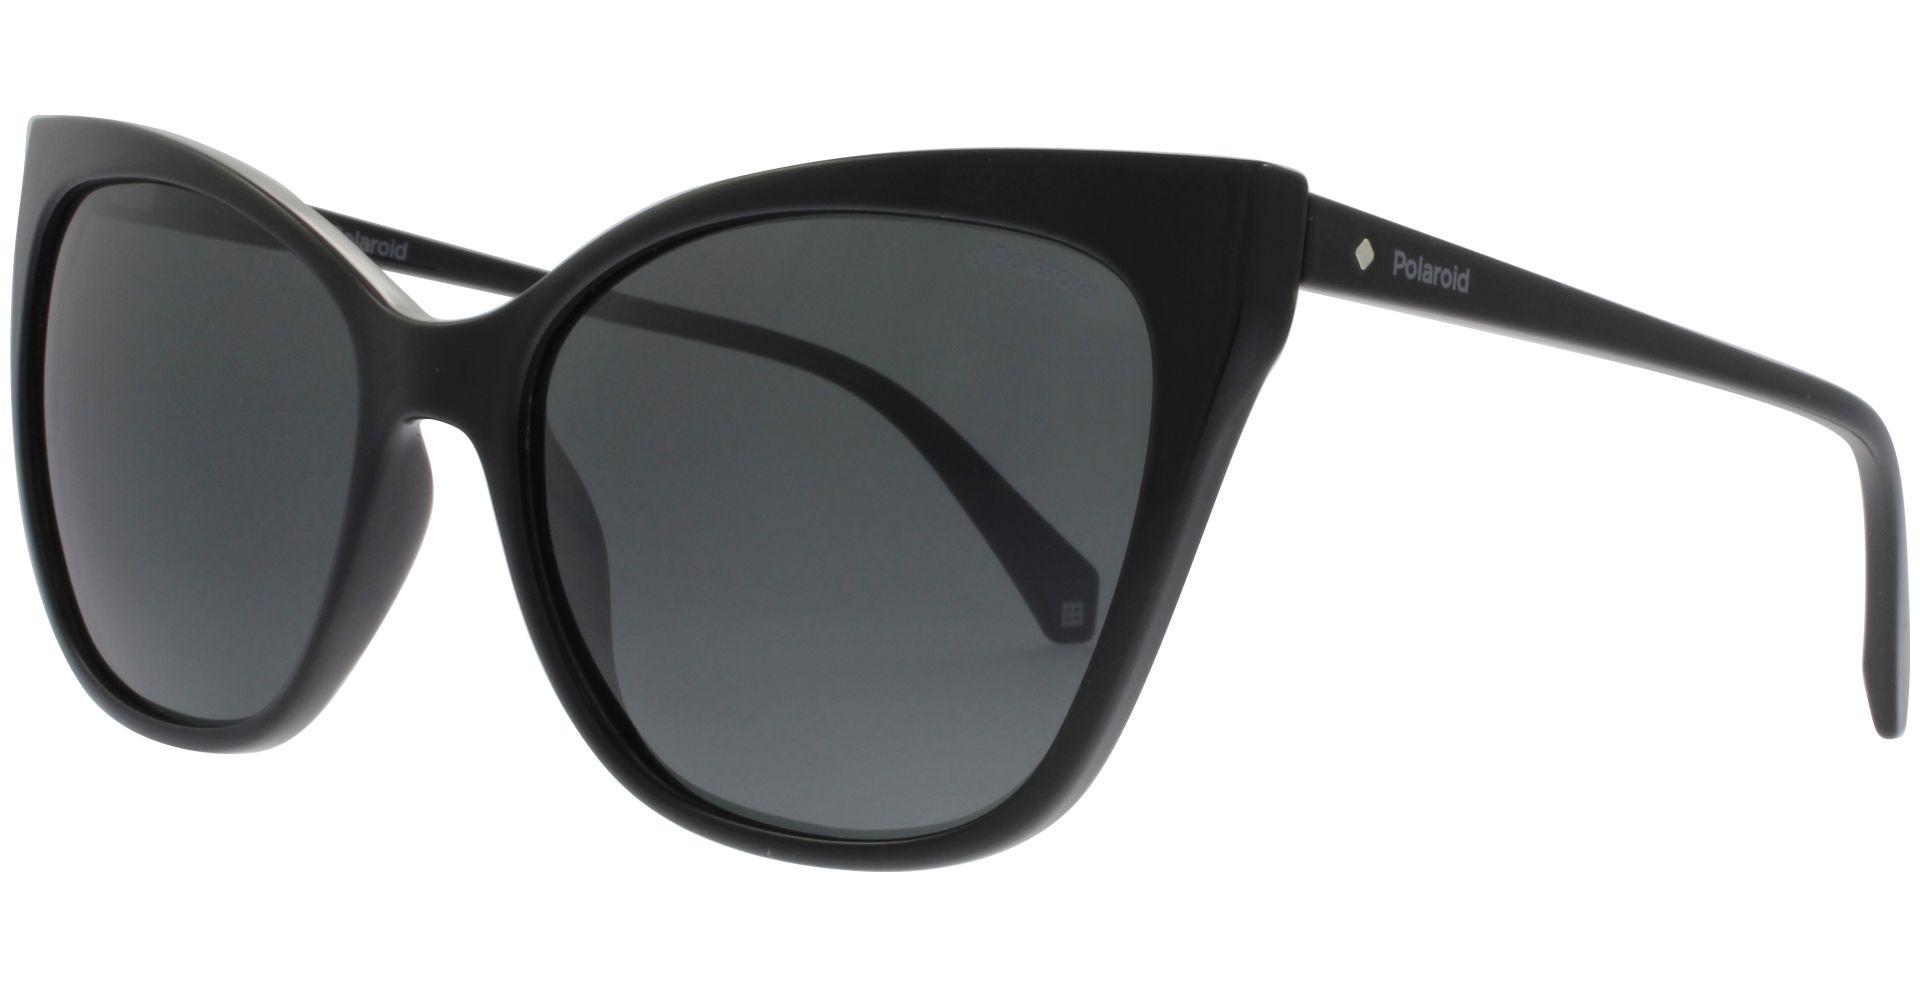 Polaroid PLD4060/S Sonnenbrille Schwarz 807 Polarisiert 57mm tCiu0oqK2n